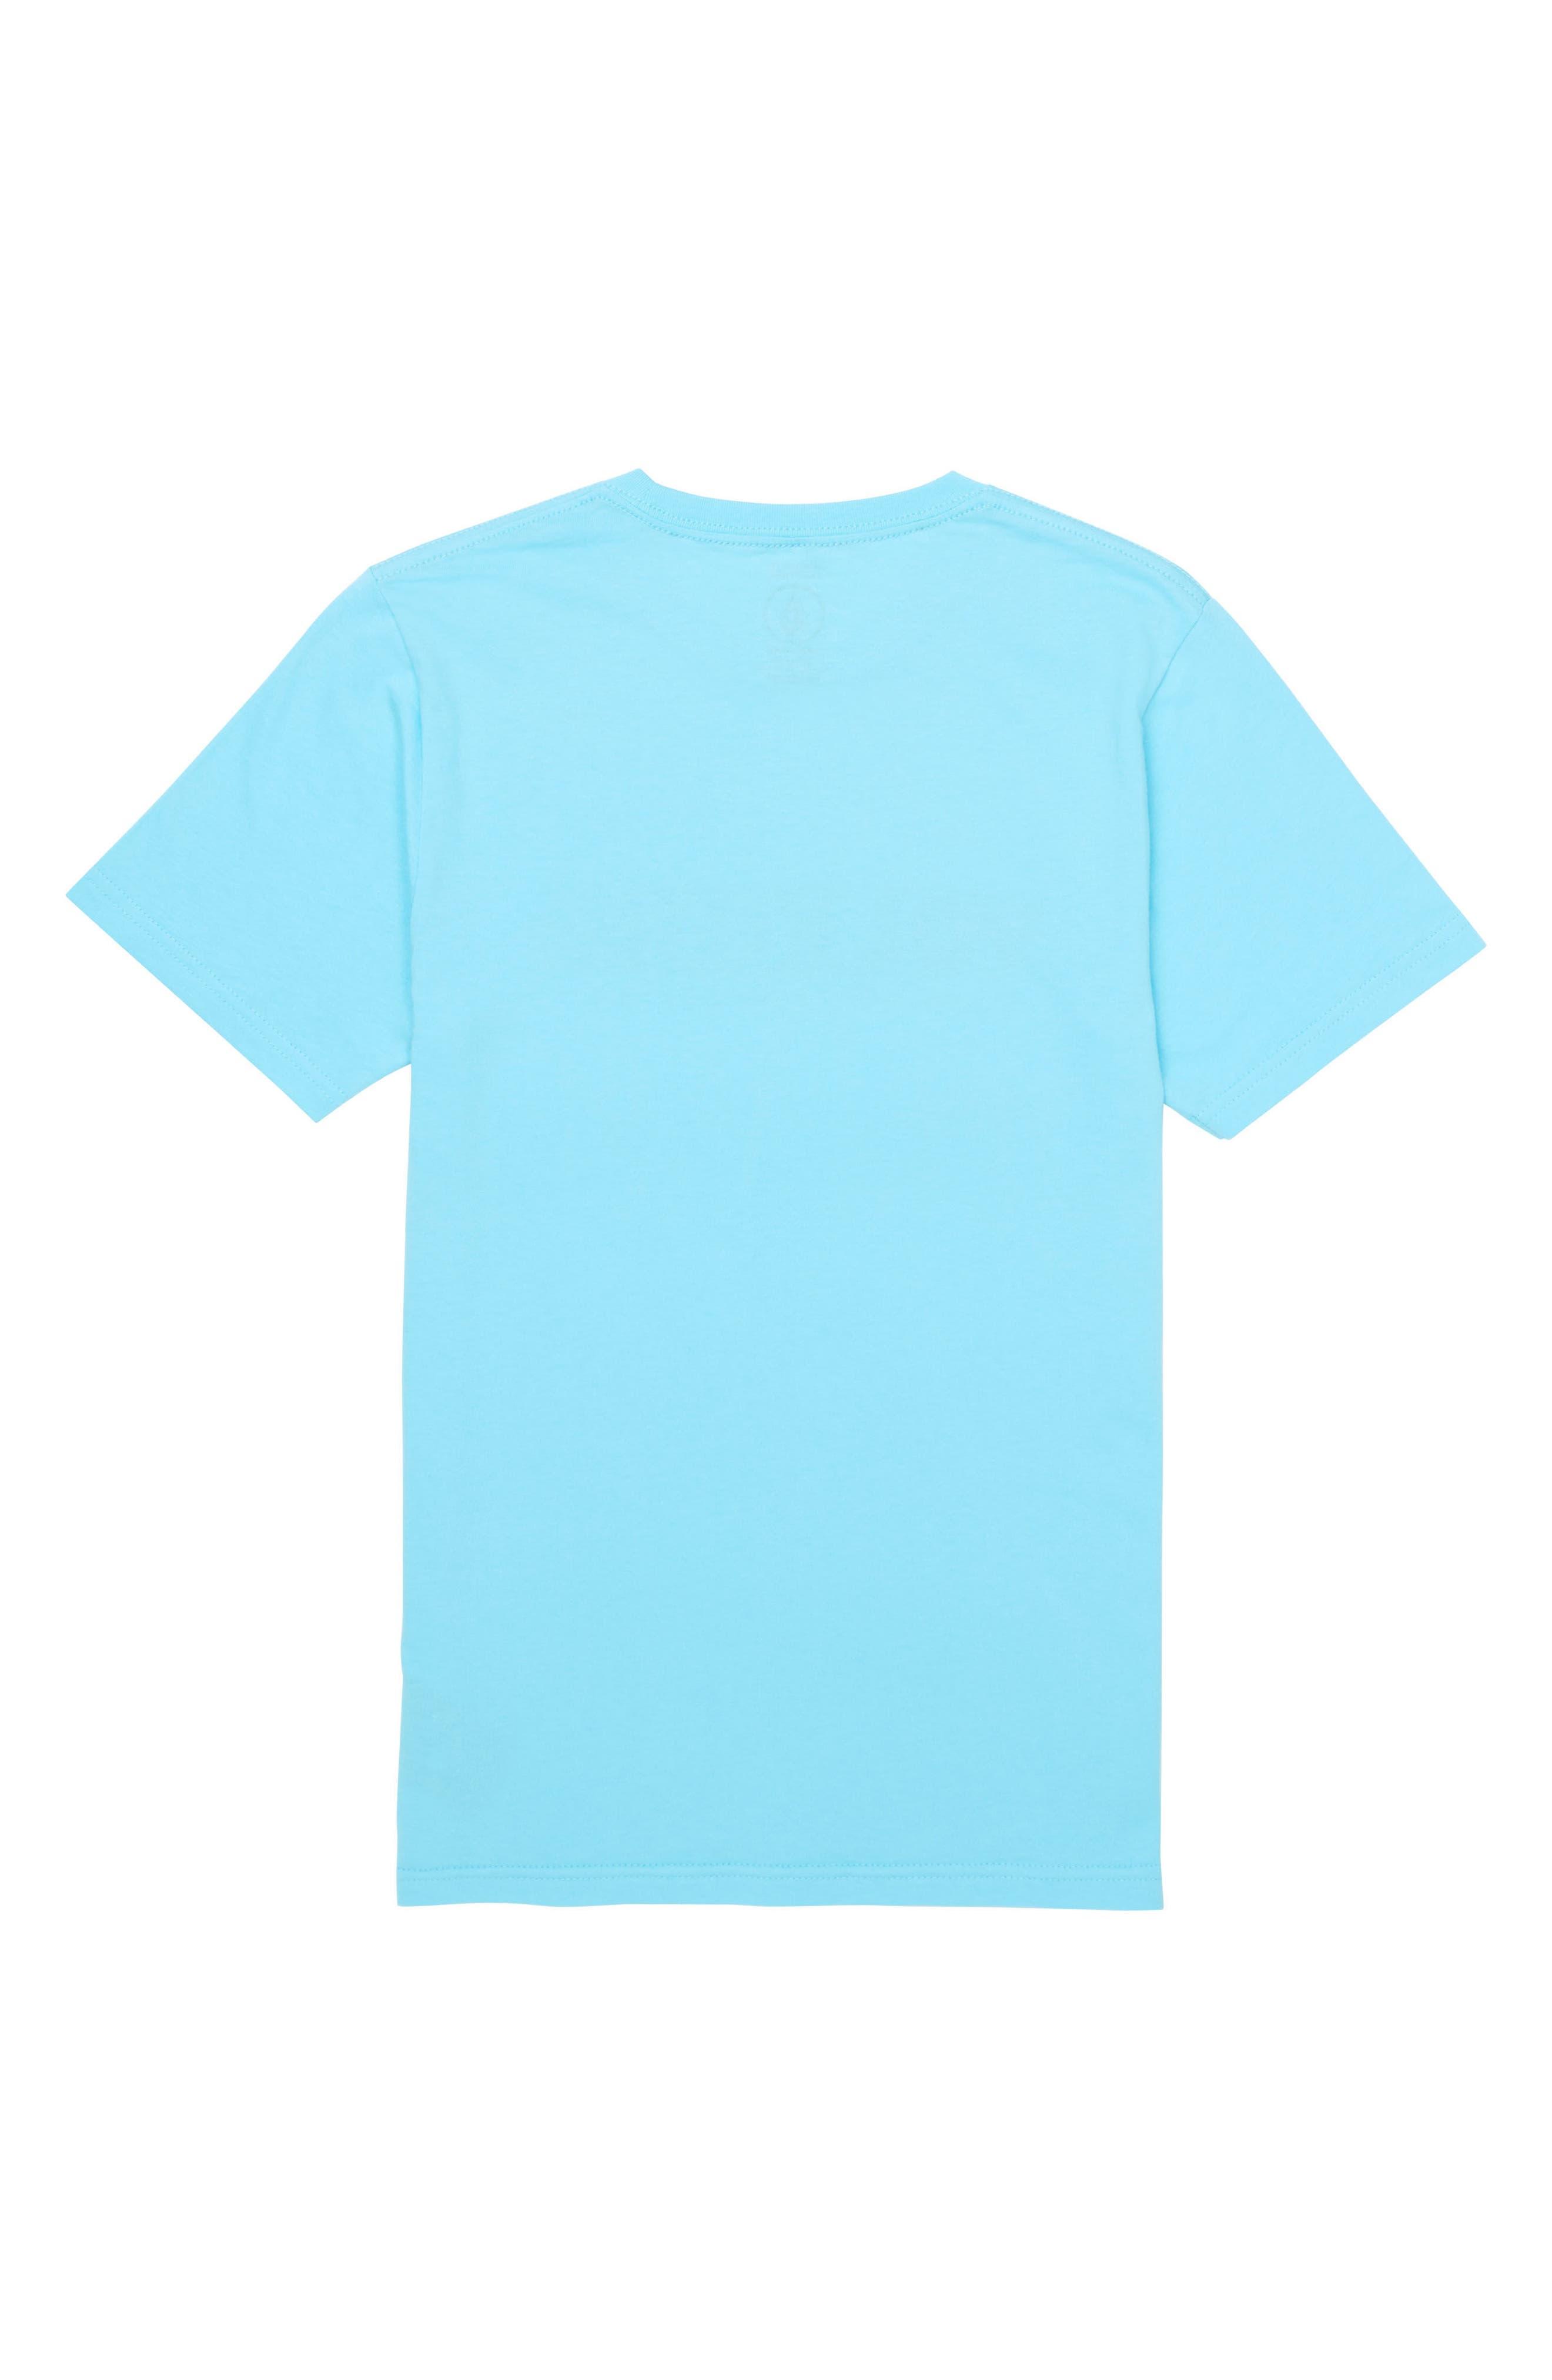 Digi Pool Graphic T-Shirt,                             Alternate thumbnail 4, color,